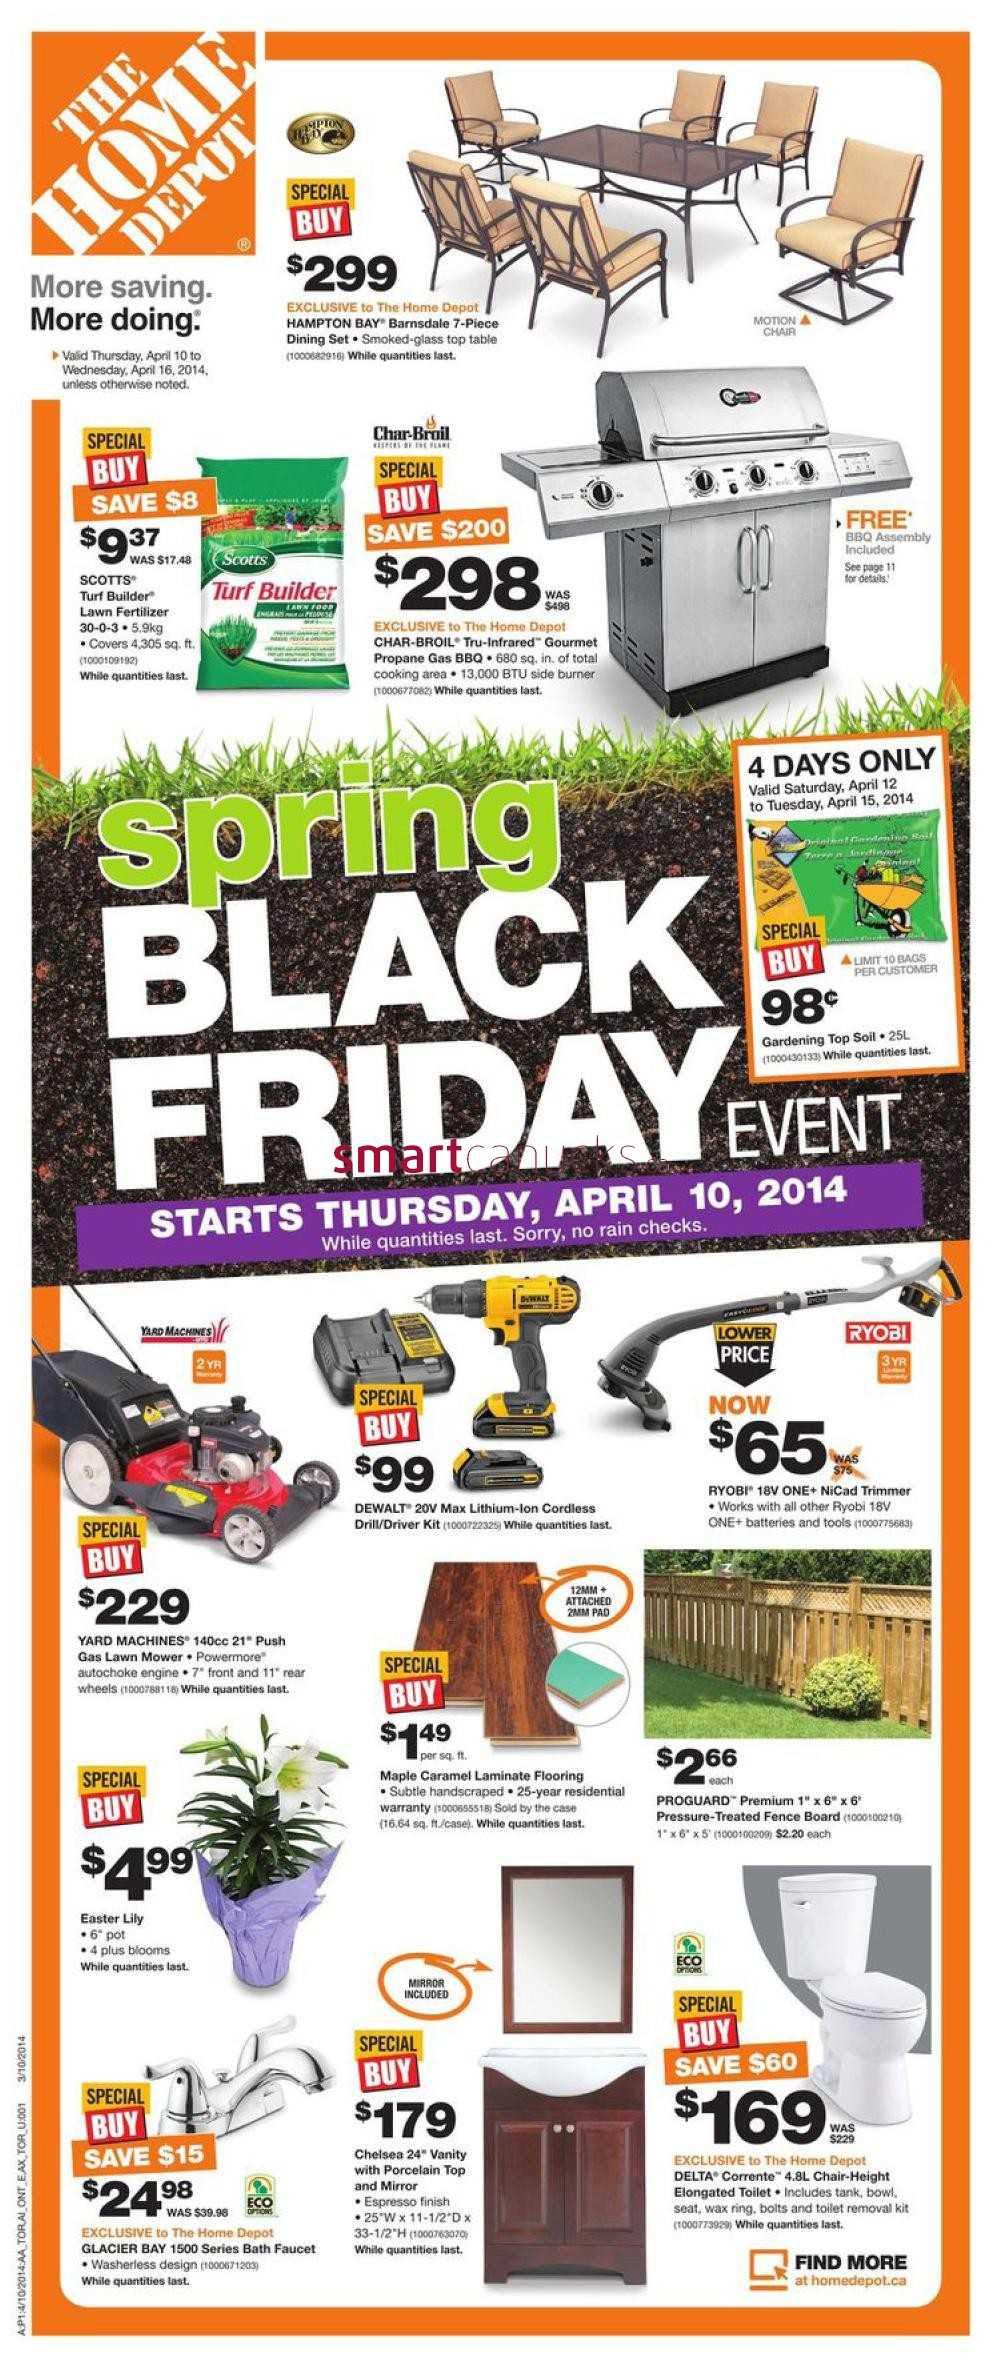 Home depot coupon 2018 Ebay deals ph